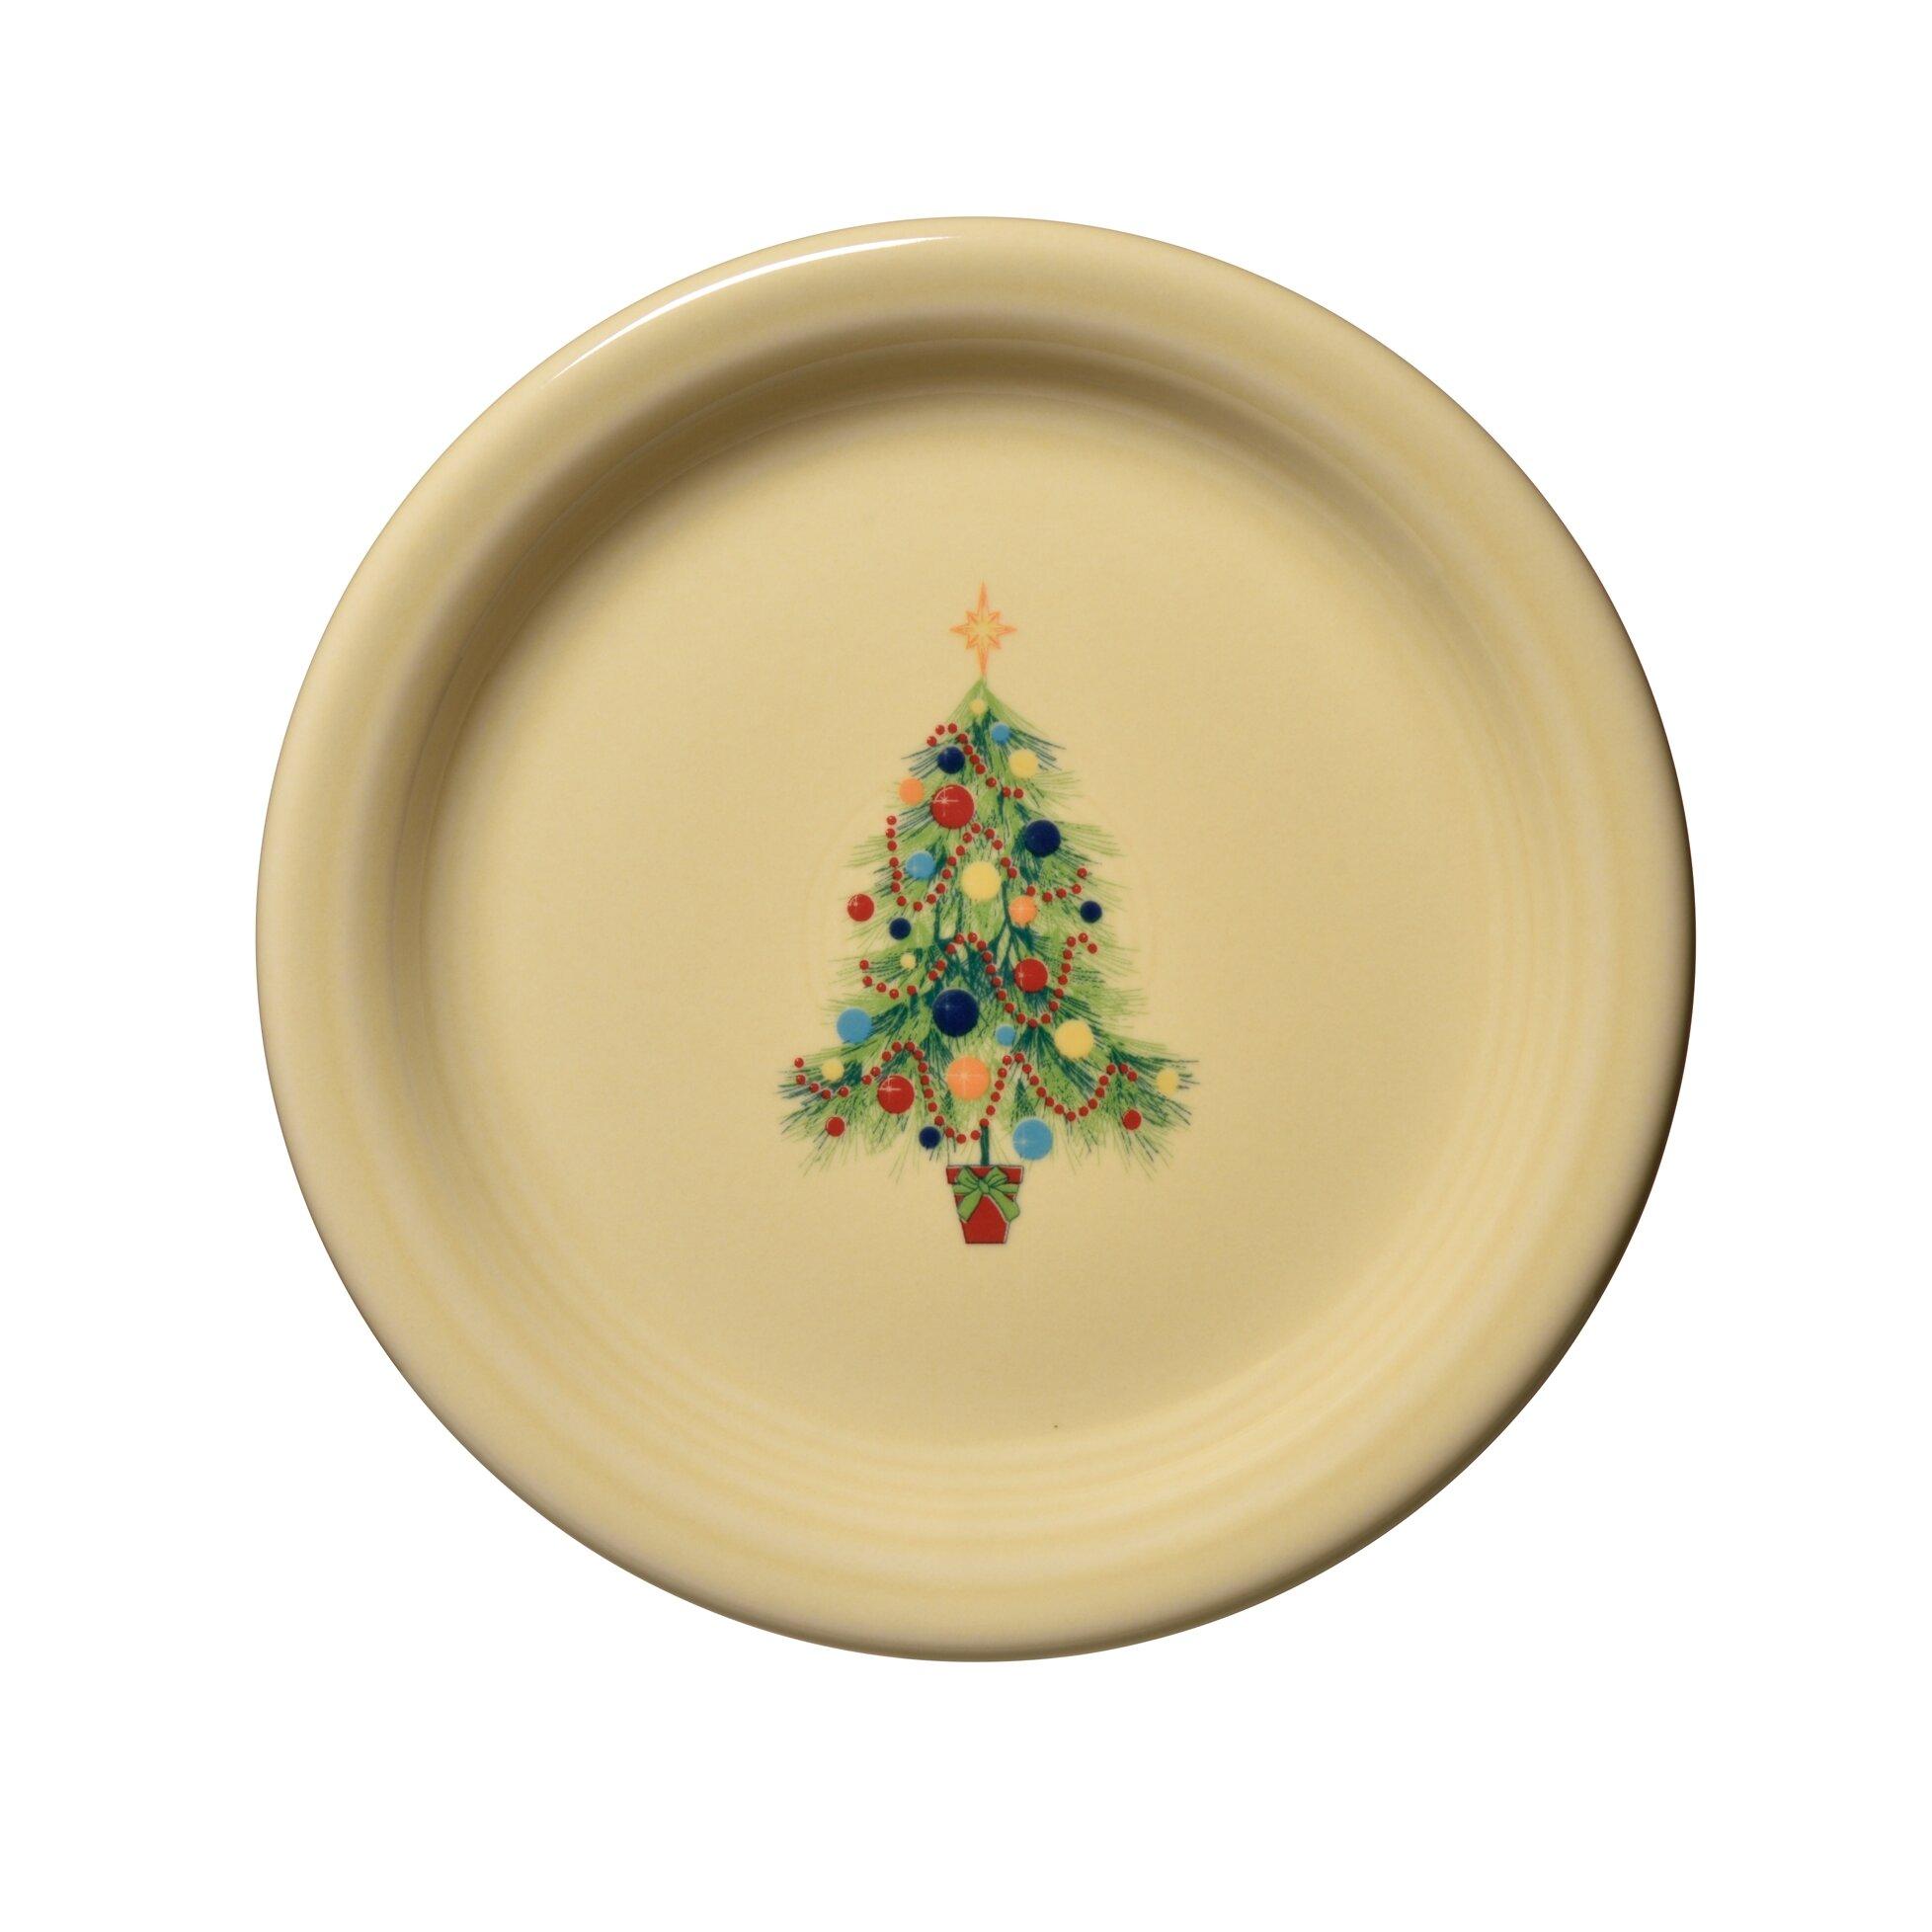 Fiesta Christmas Tree Appetizer Plate & Reviews | Wayfair